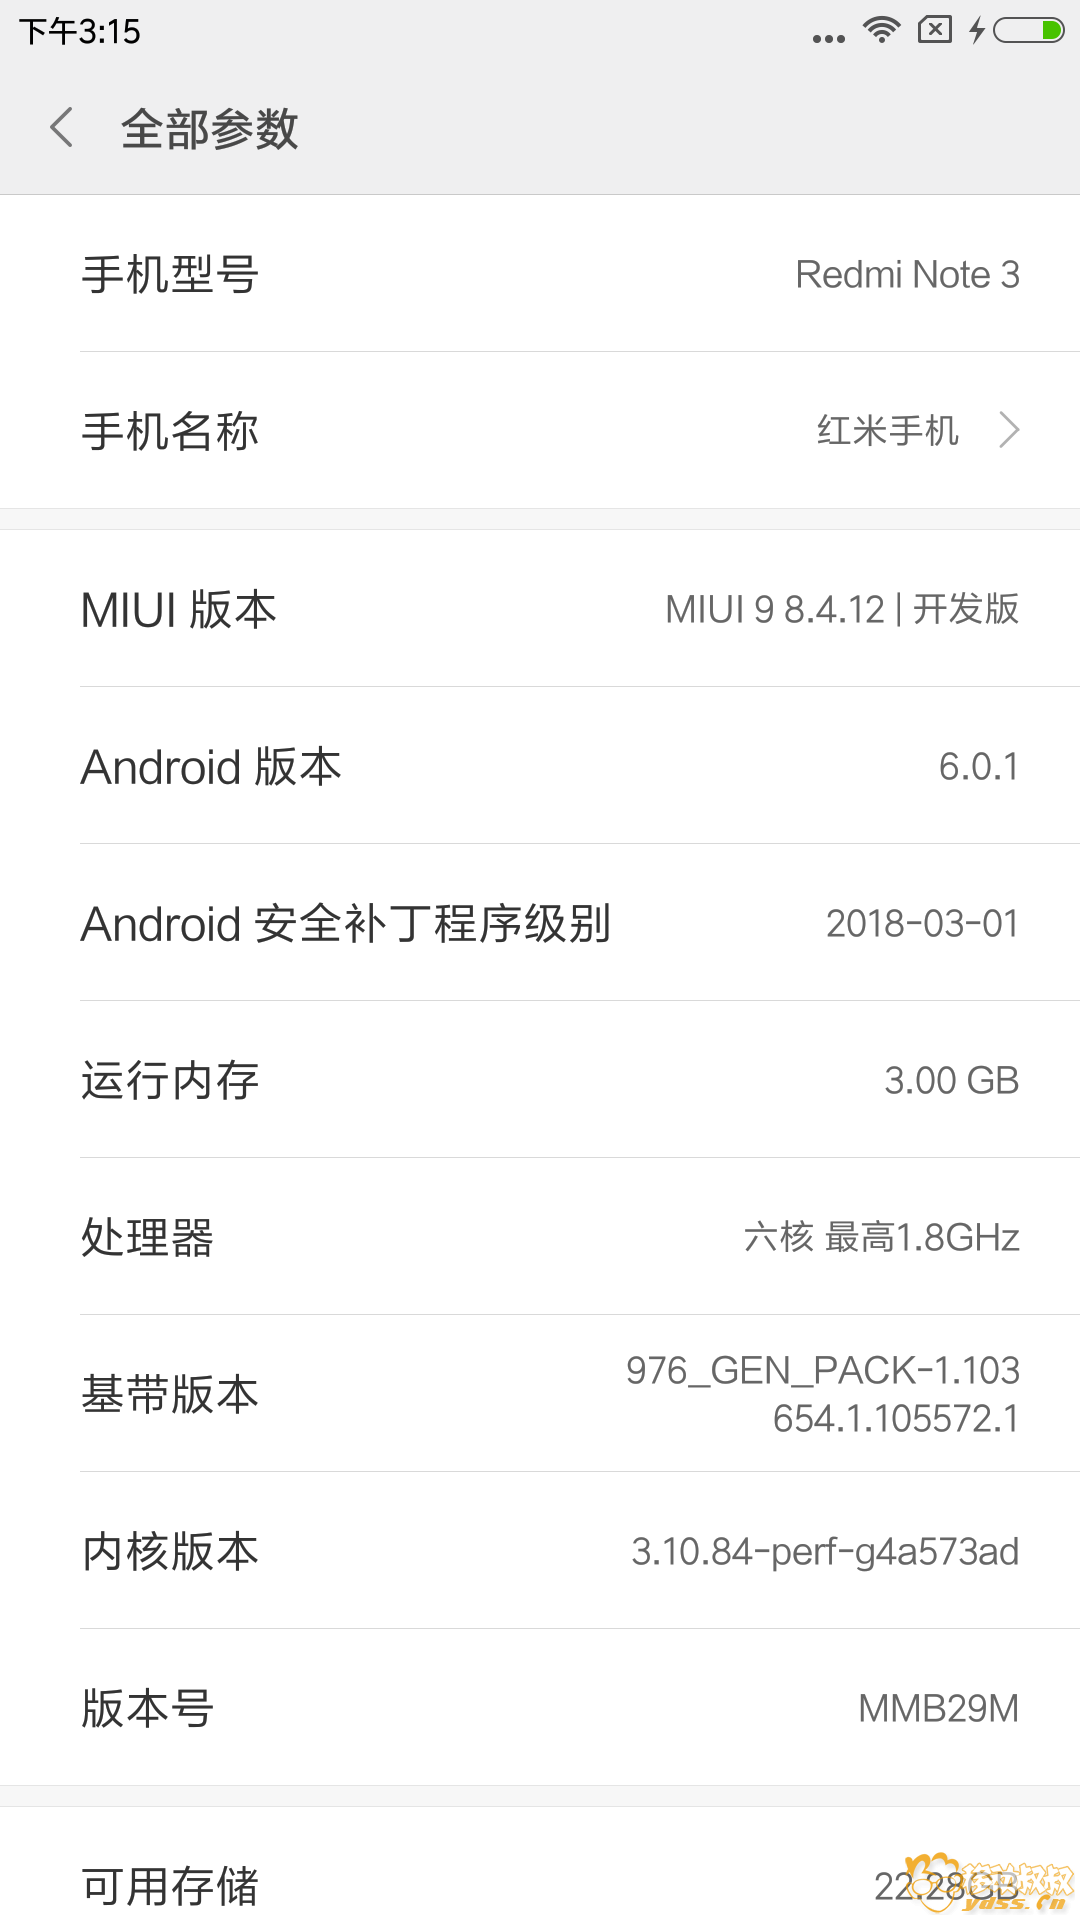 Screenshot_2018-04-13-15-15-59-414_com.android.settings.png